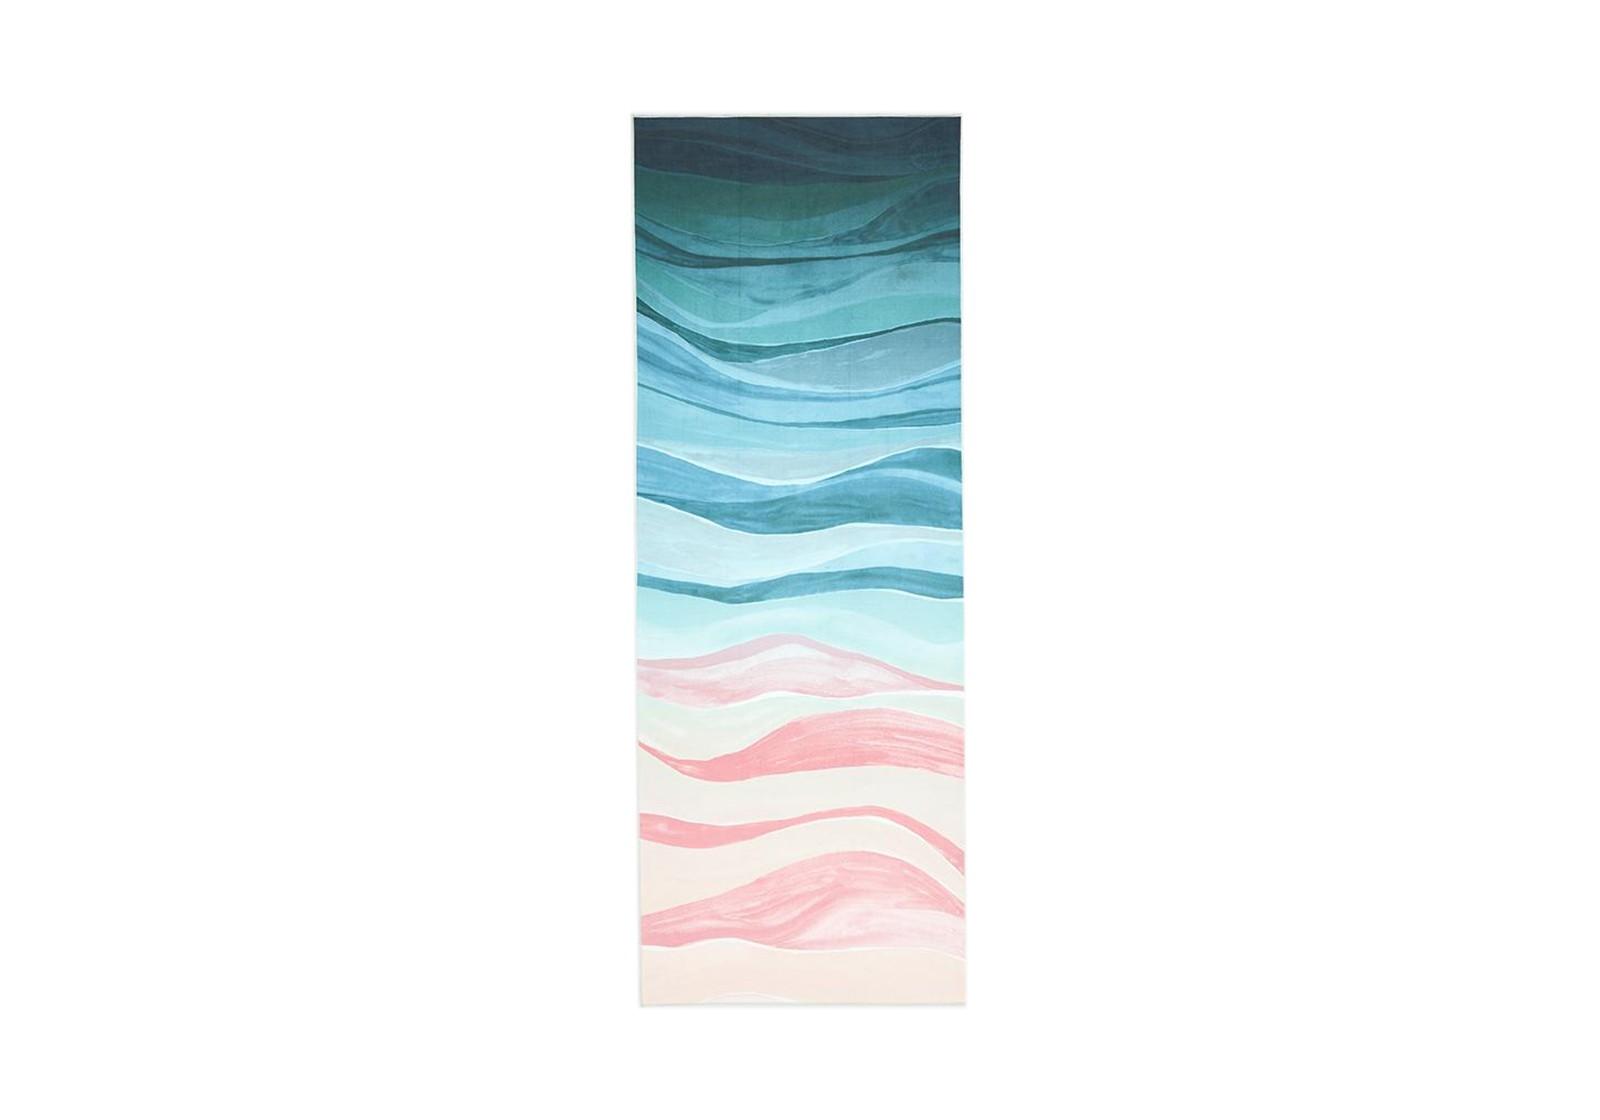 equa-mat-towel-ebb-and-flow-manduka-183×67-sm